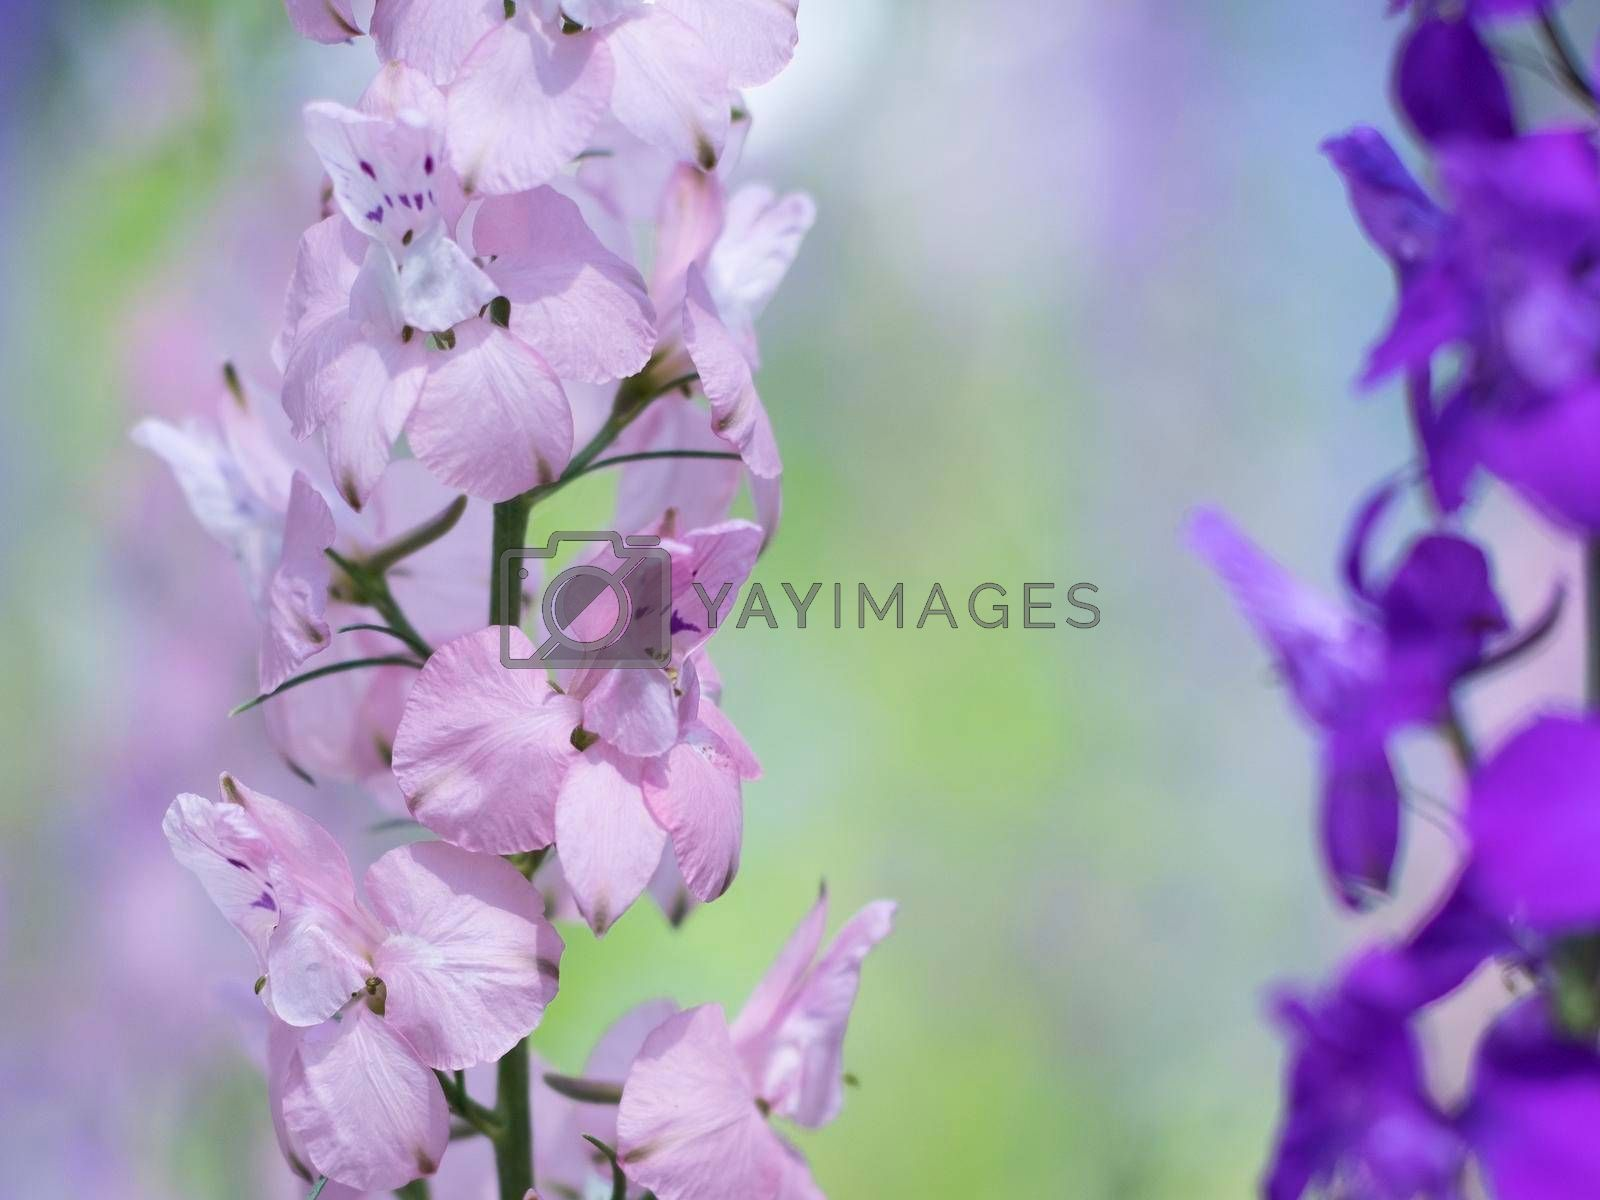 Pink-delicate annual delphinium flowers close-up.